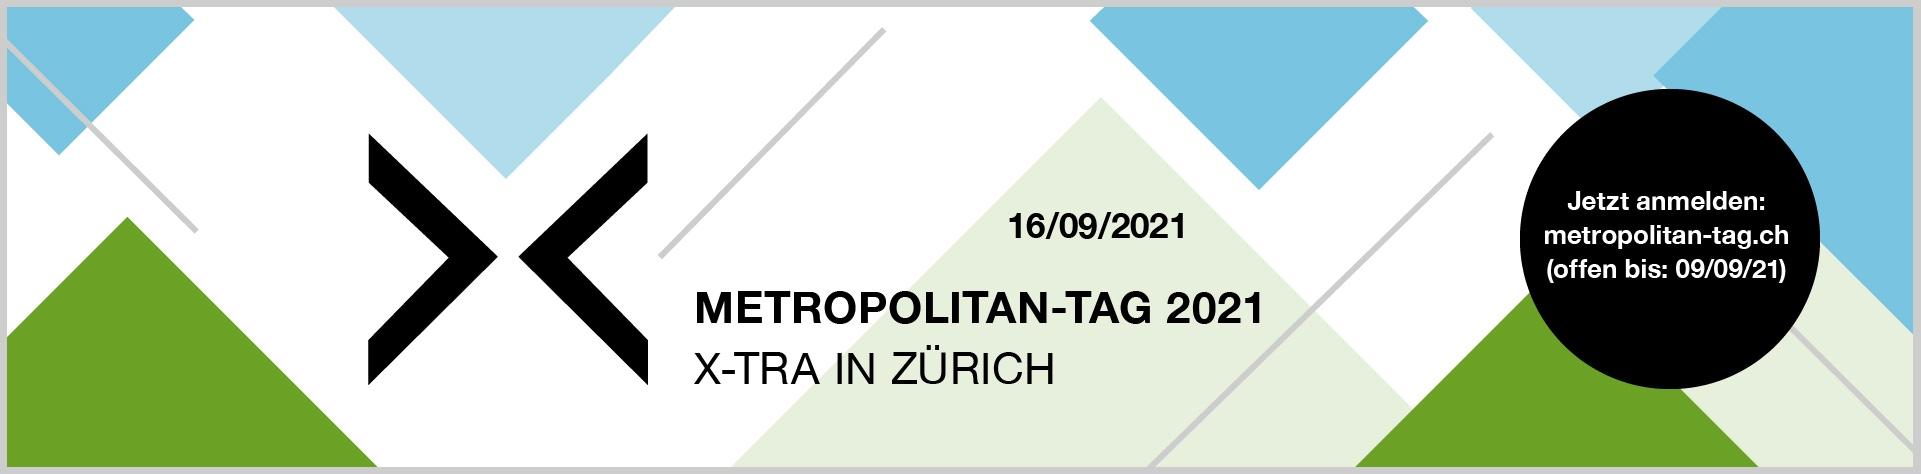 Metropolitan-Tag